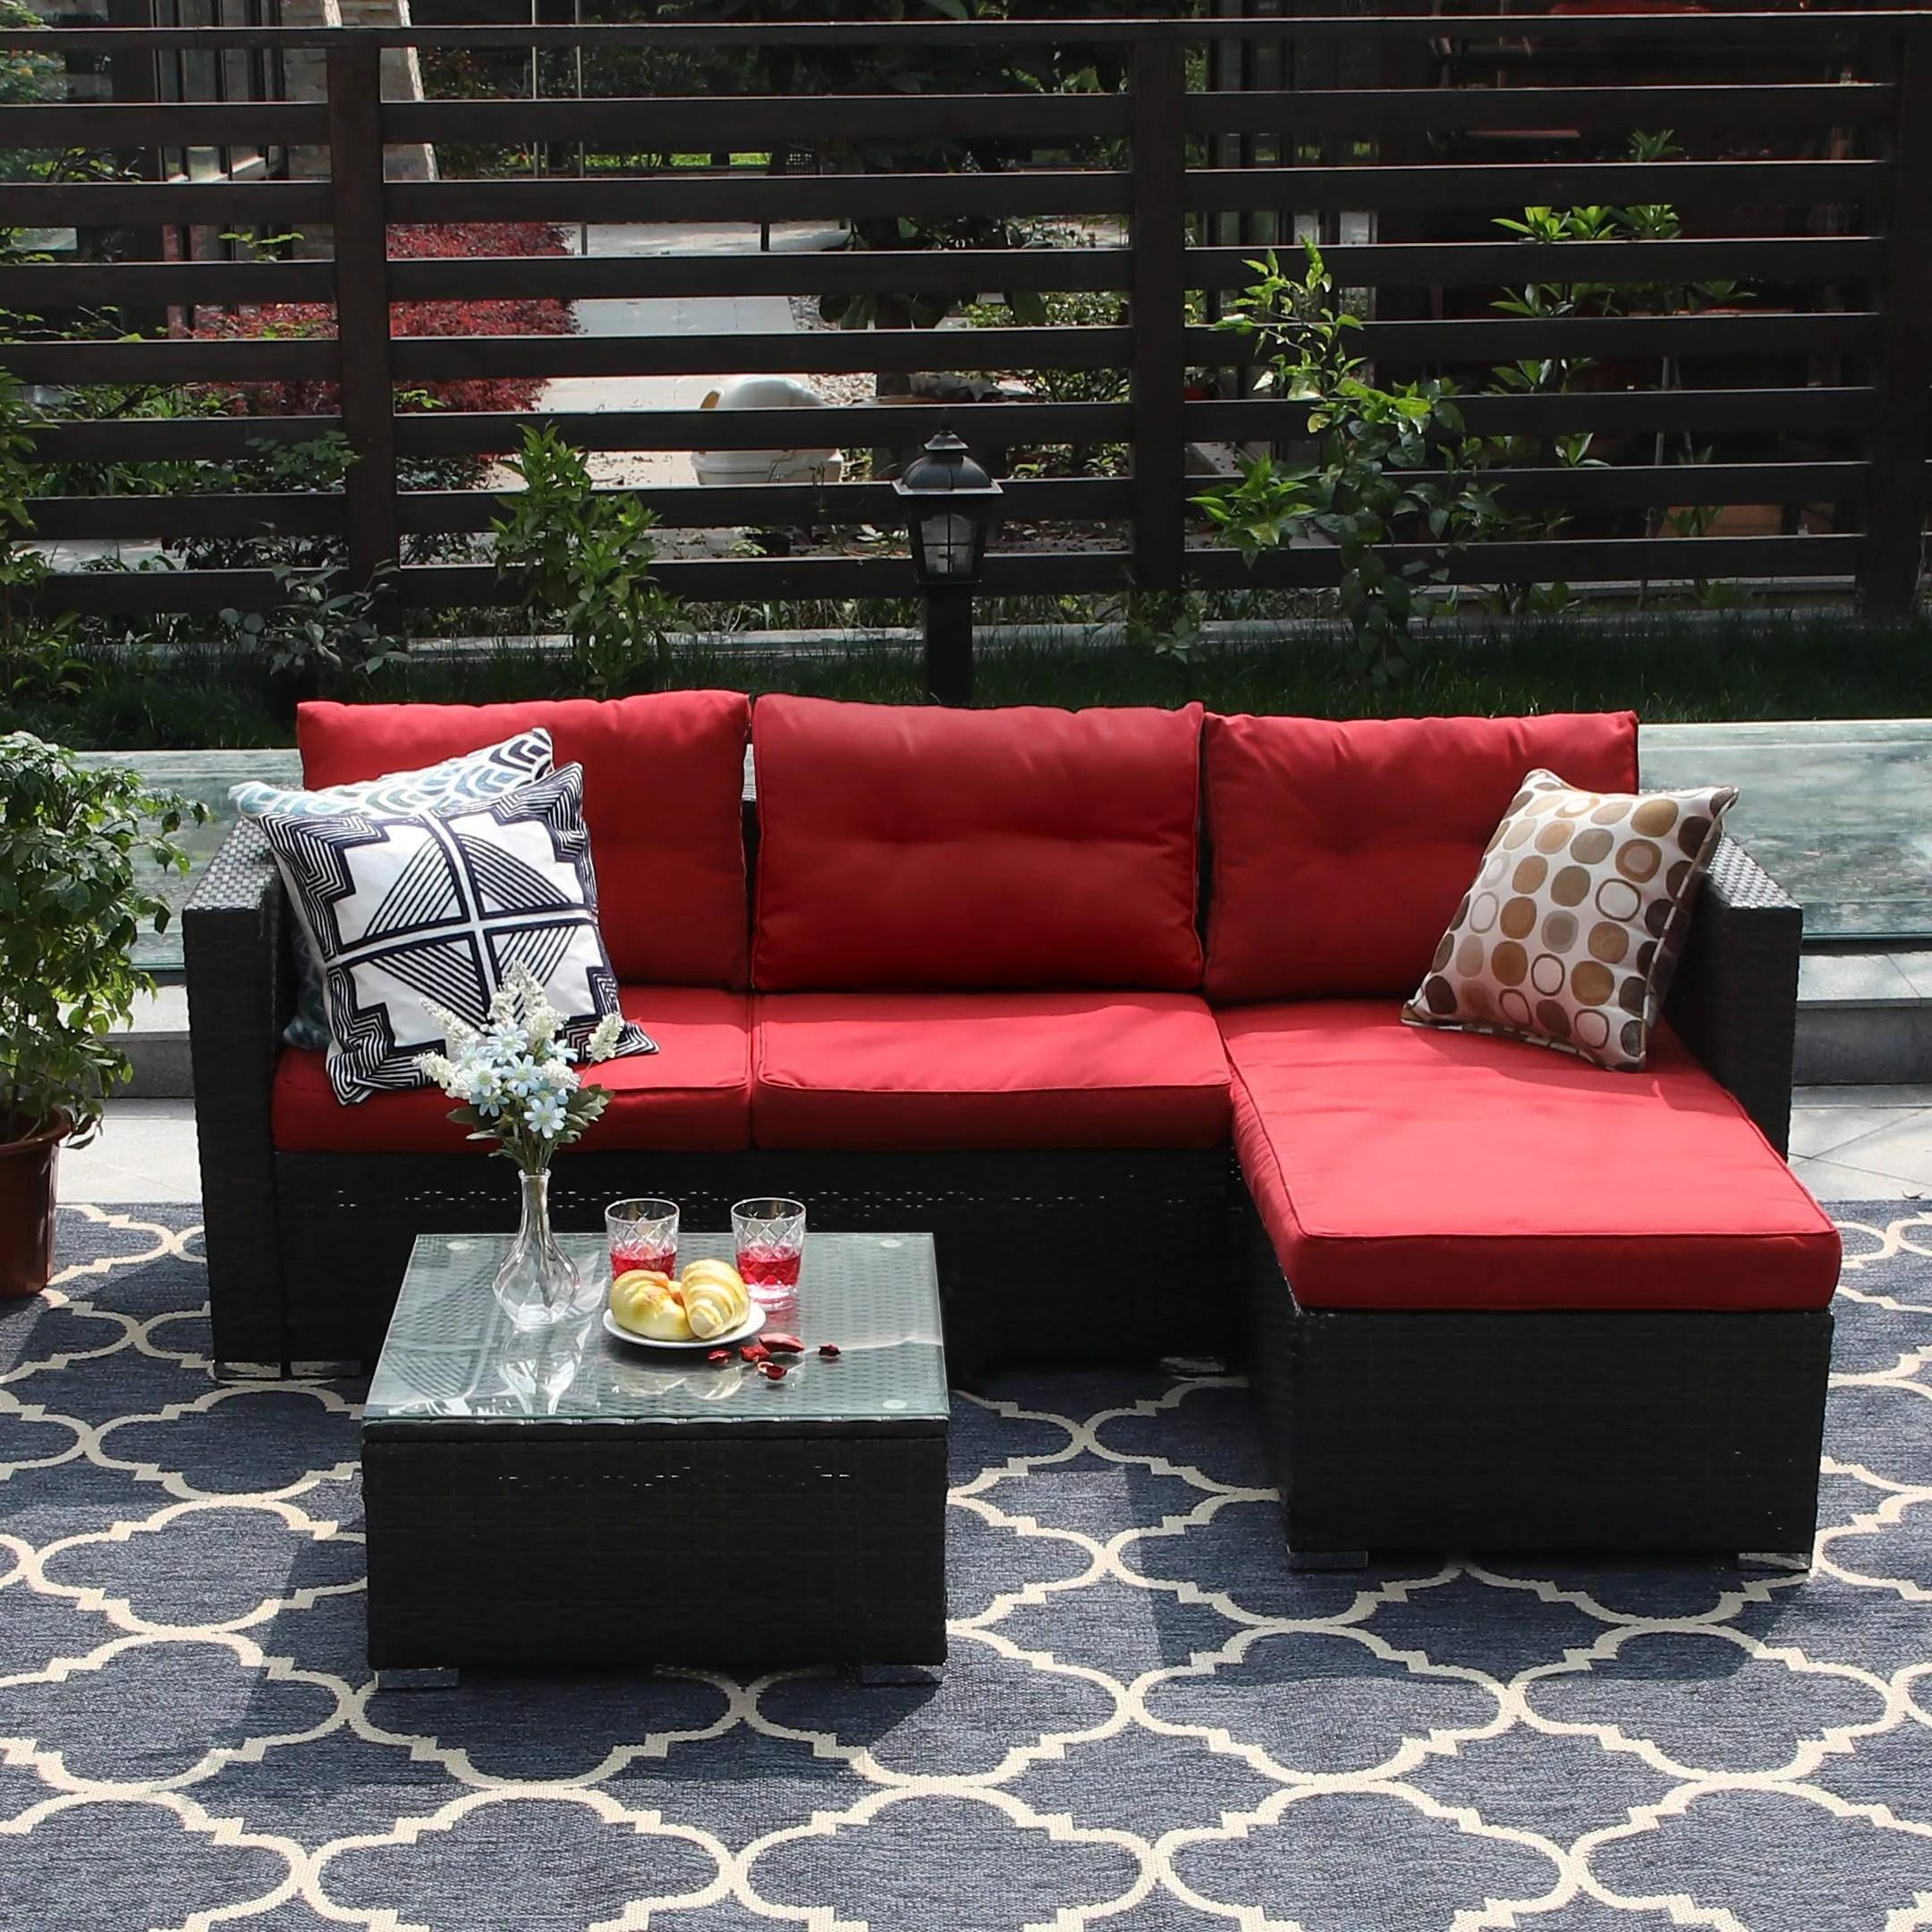 phi villa 3 piece patio furniture set rattan sectional sofa furniture